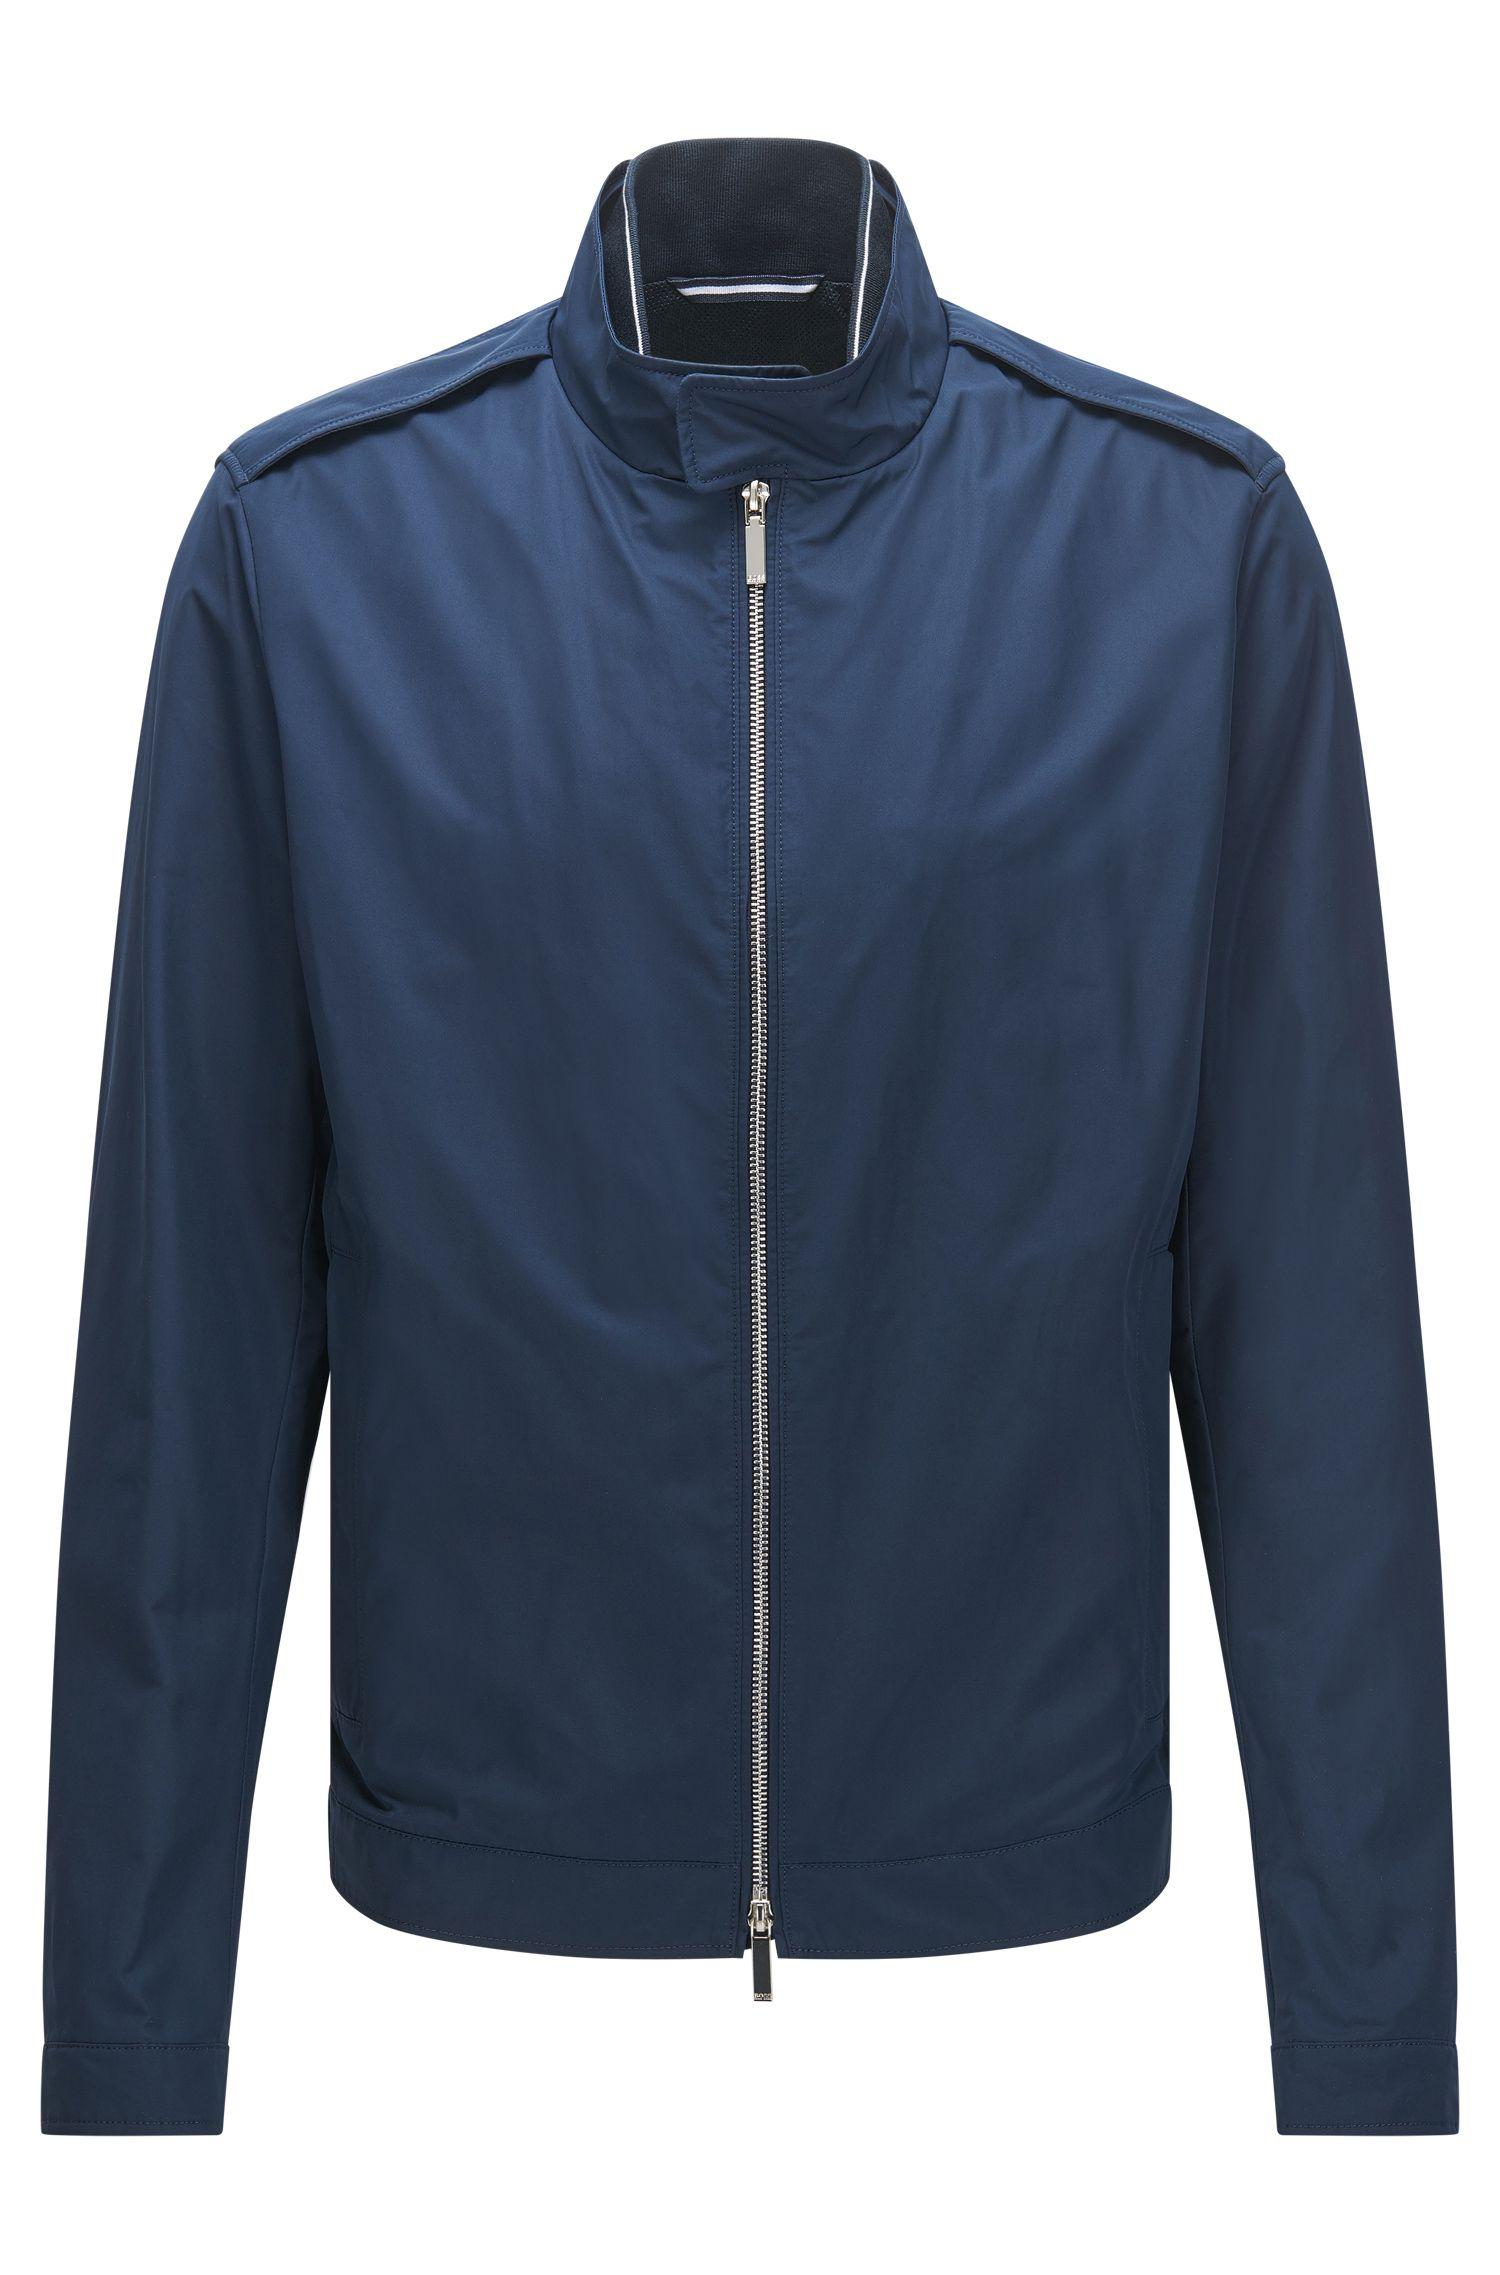 Water-Repellent Jacket | Cael